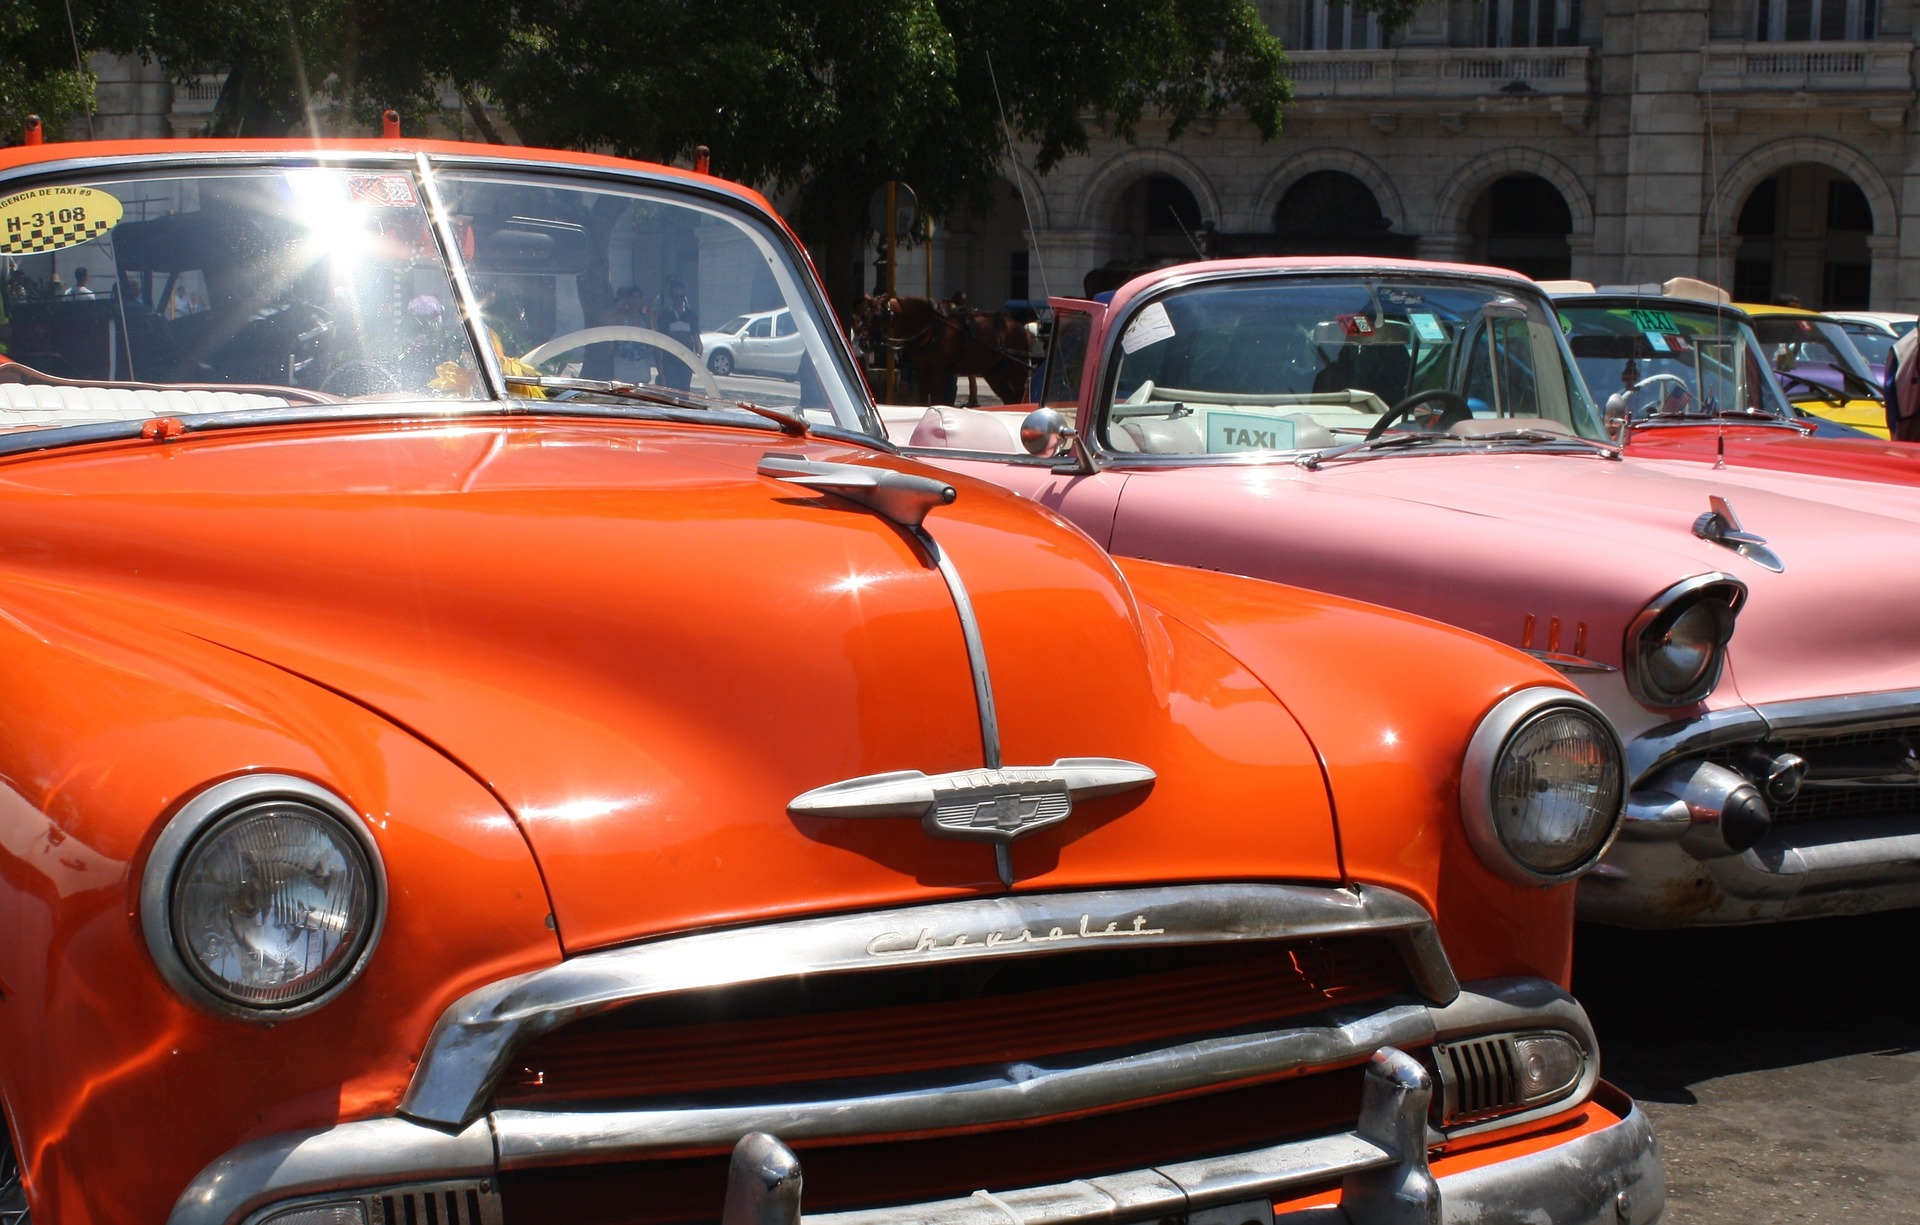 Taxis in Cuba